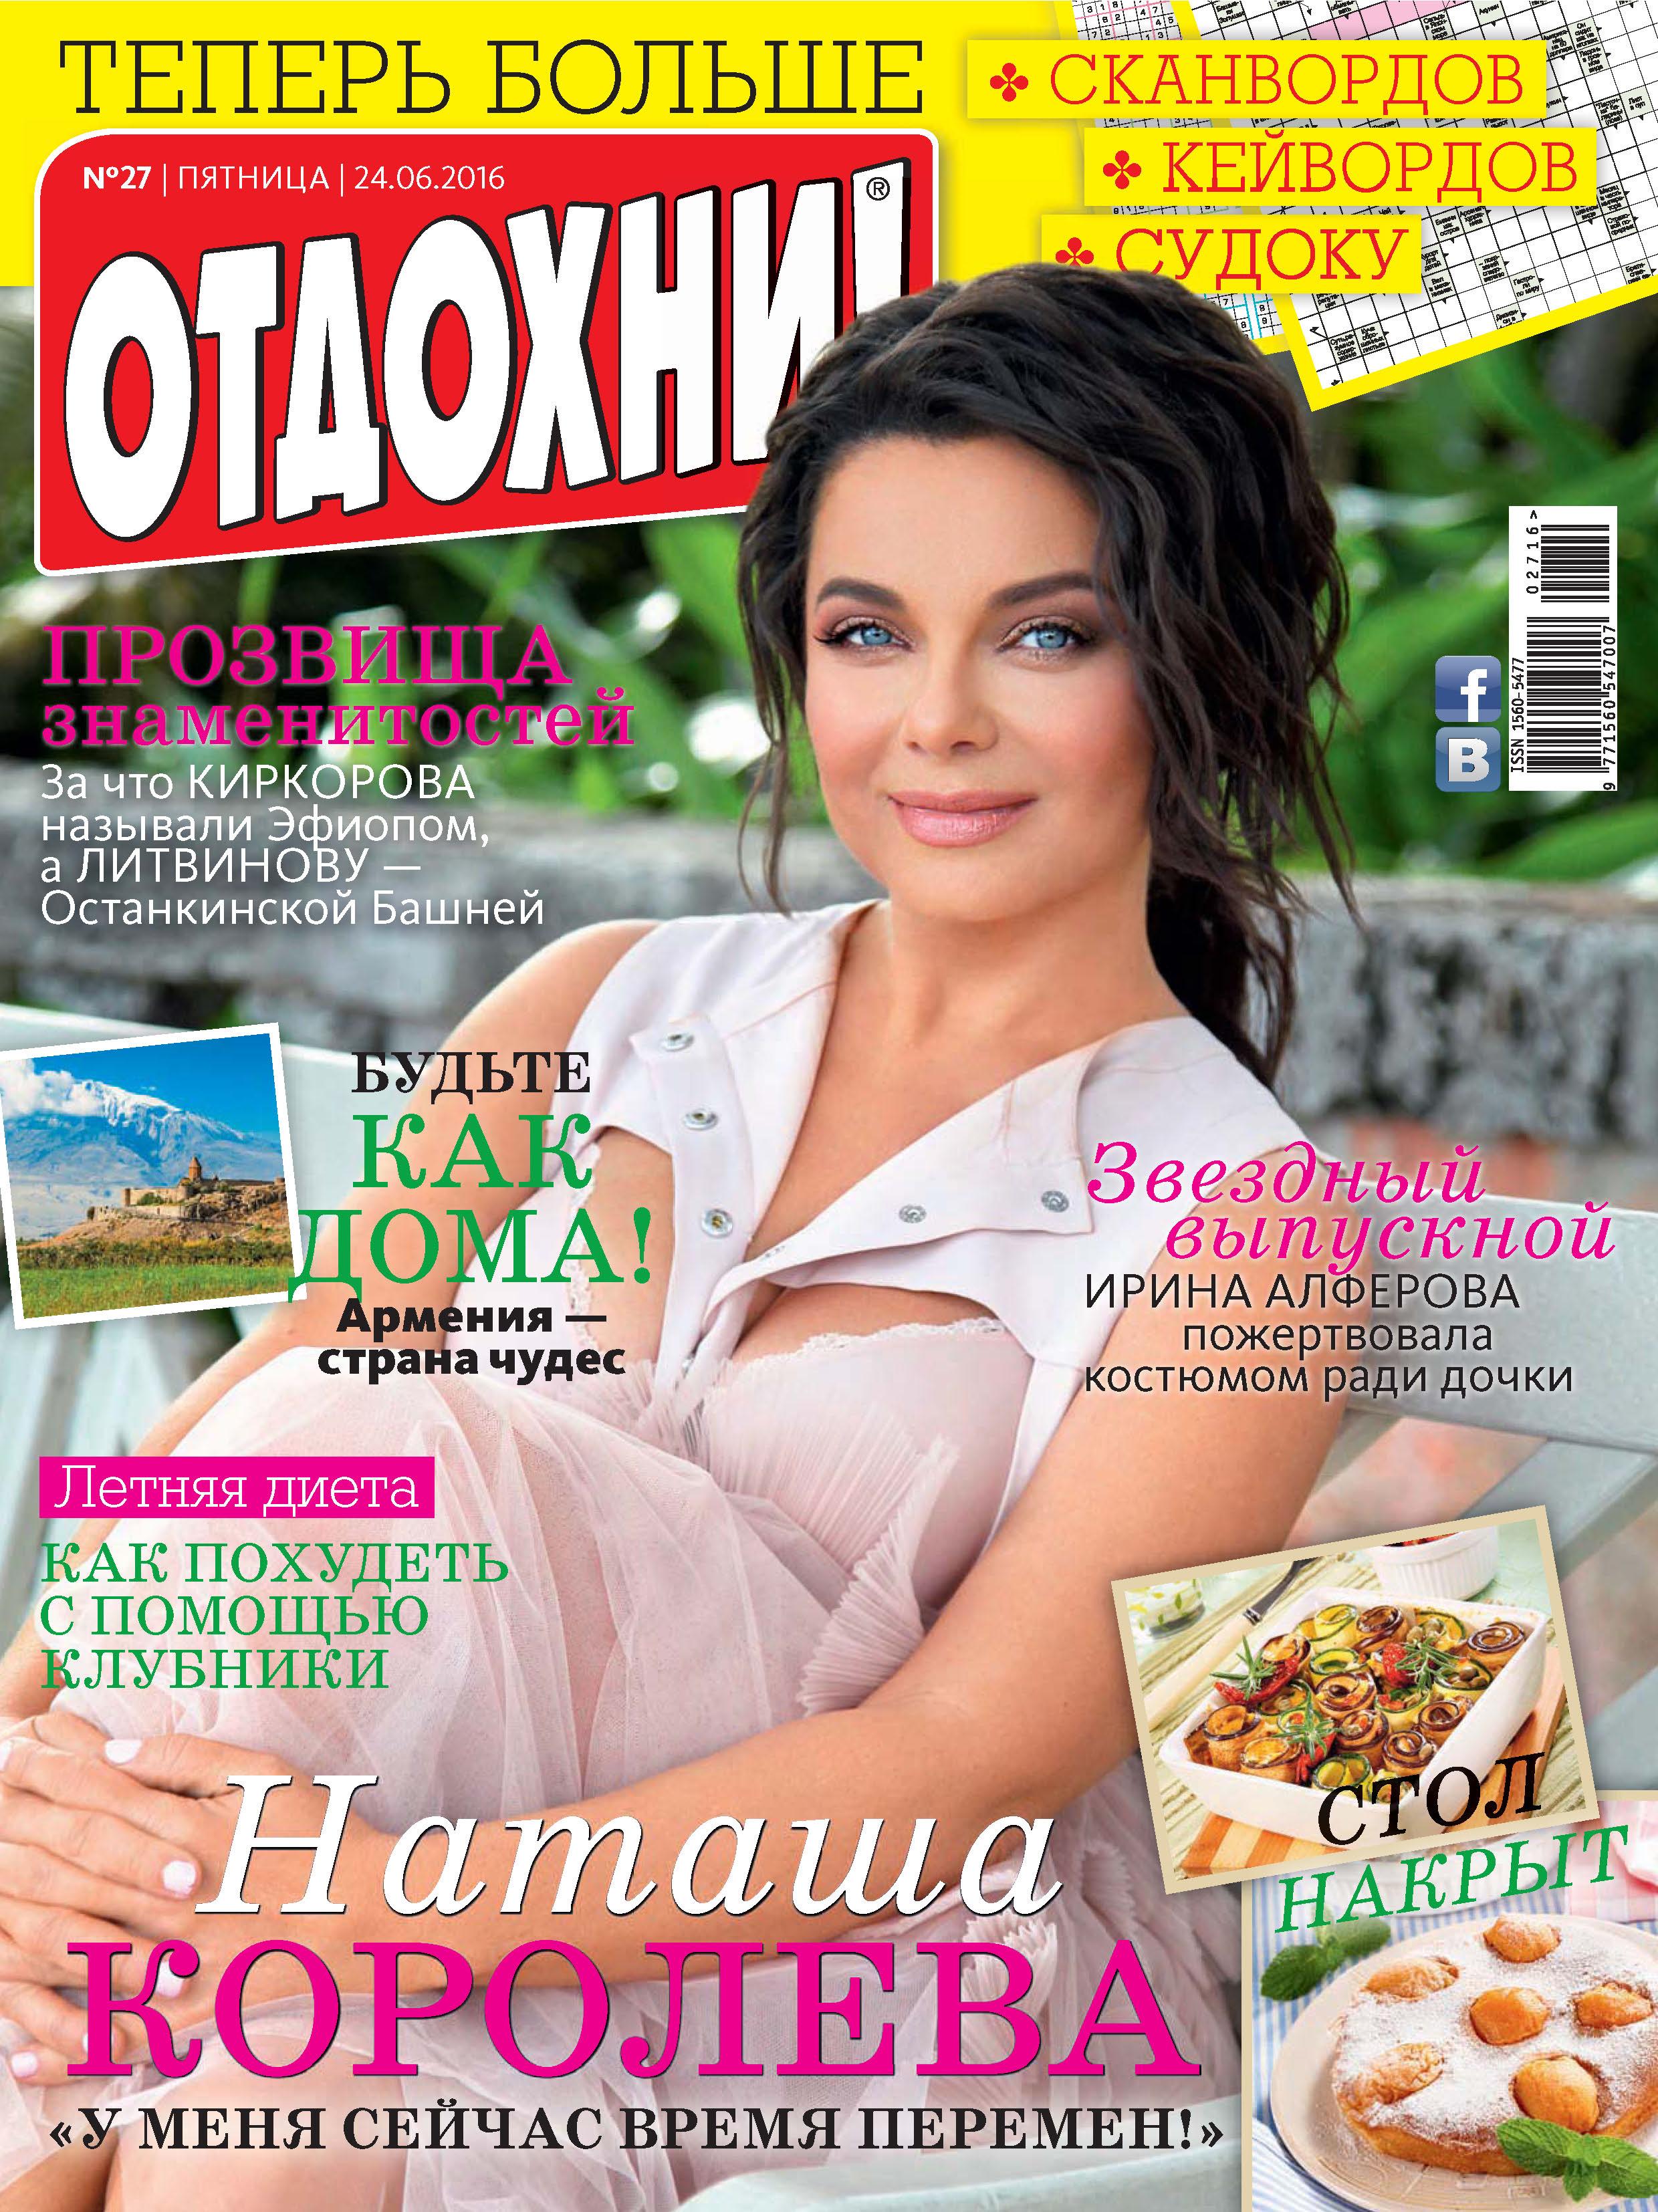 ИД «Бурда» Журнал «Отдохни!» №27/2016 ид бурда журнал отдохни 39 2016